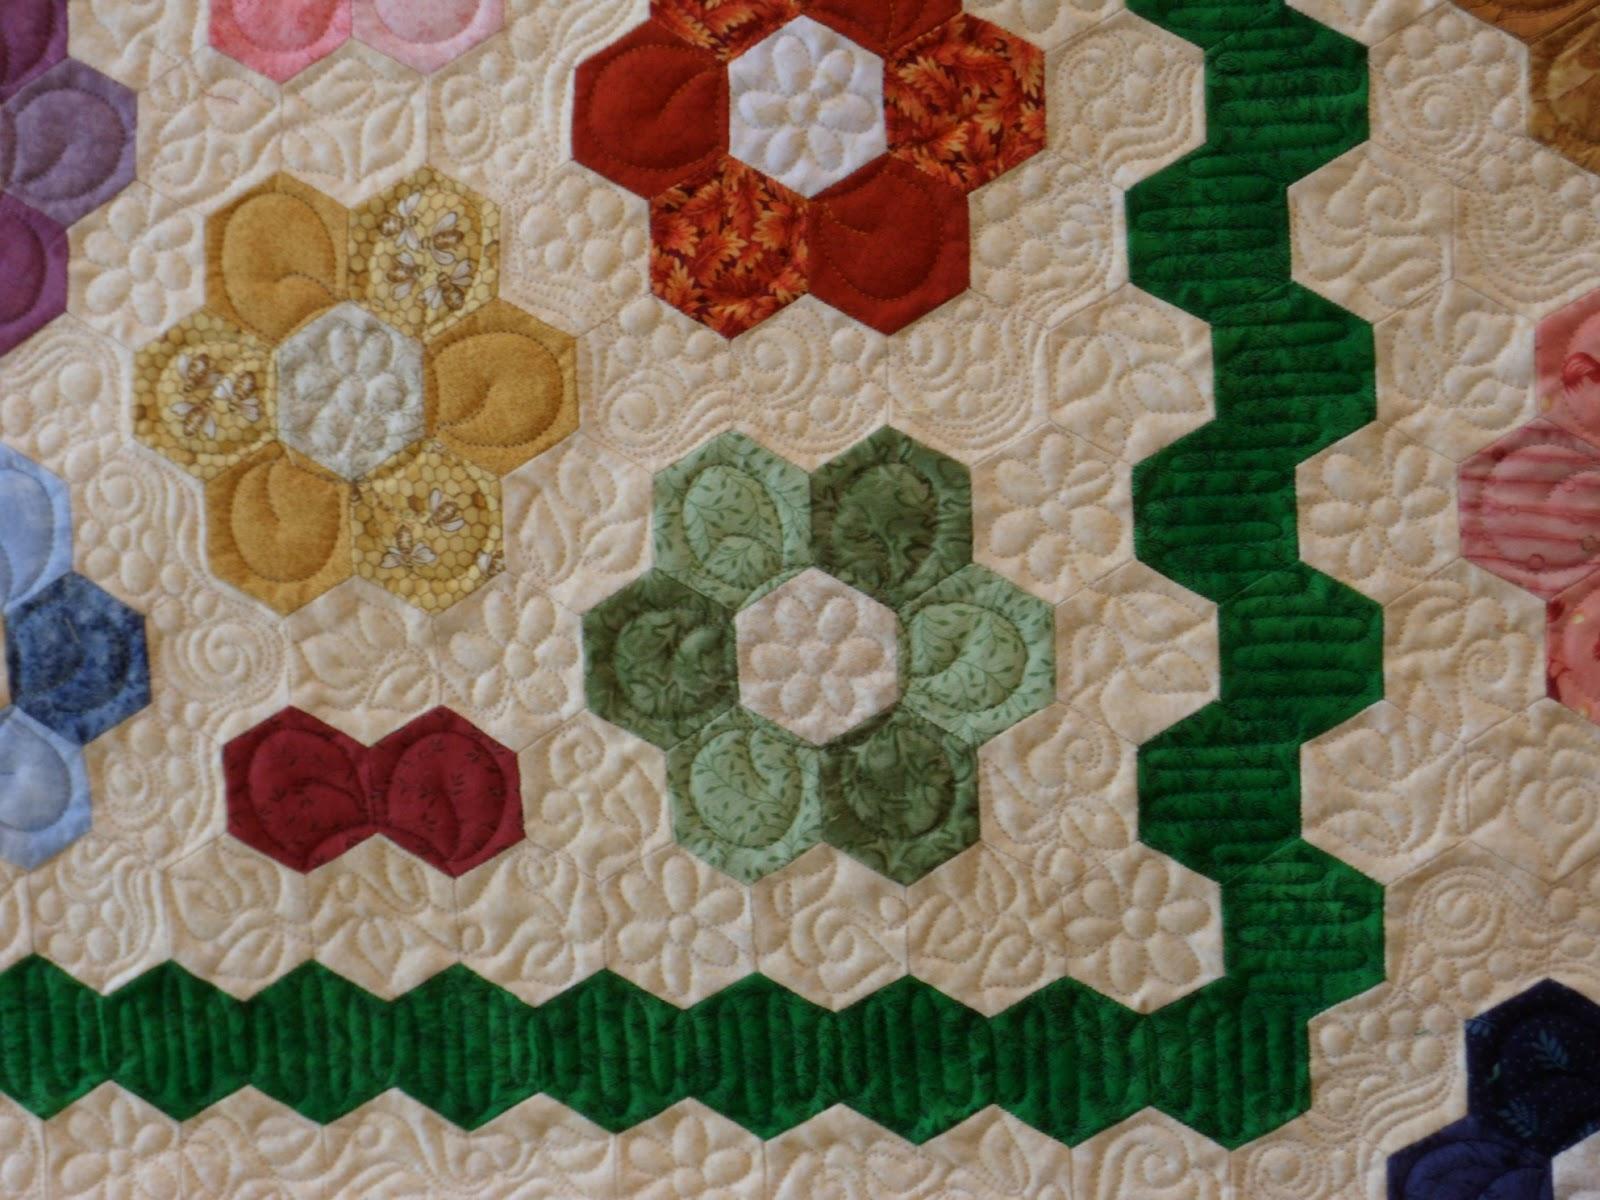 Eucalypt ridge quilting grandmother 39 s flower garden - Grandmother s flower garden quilt ...